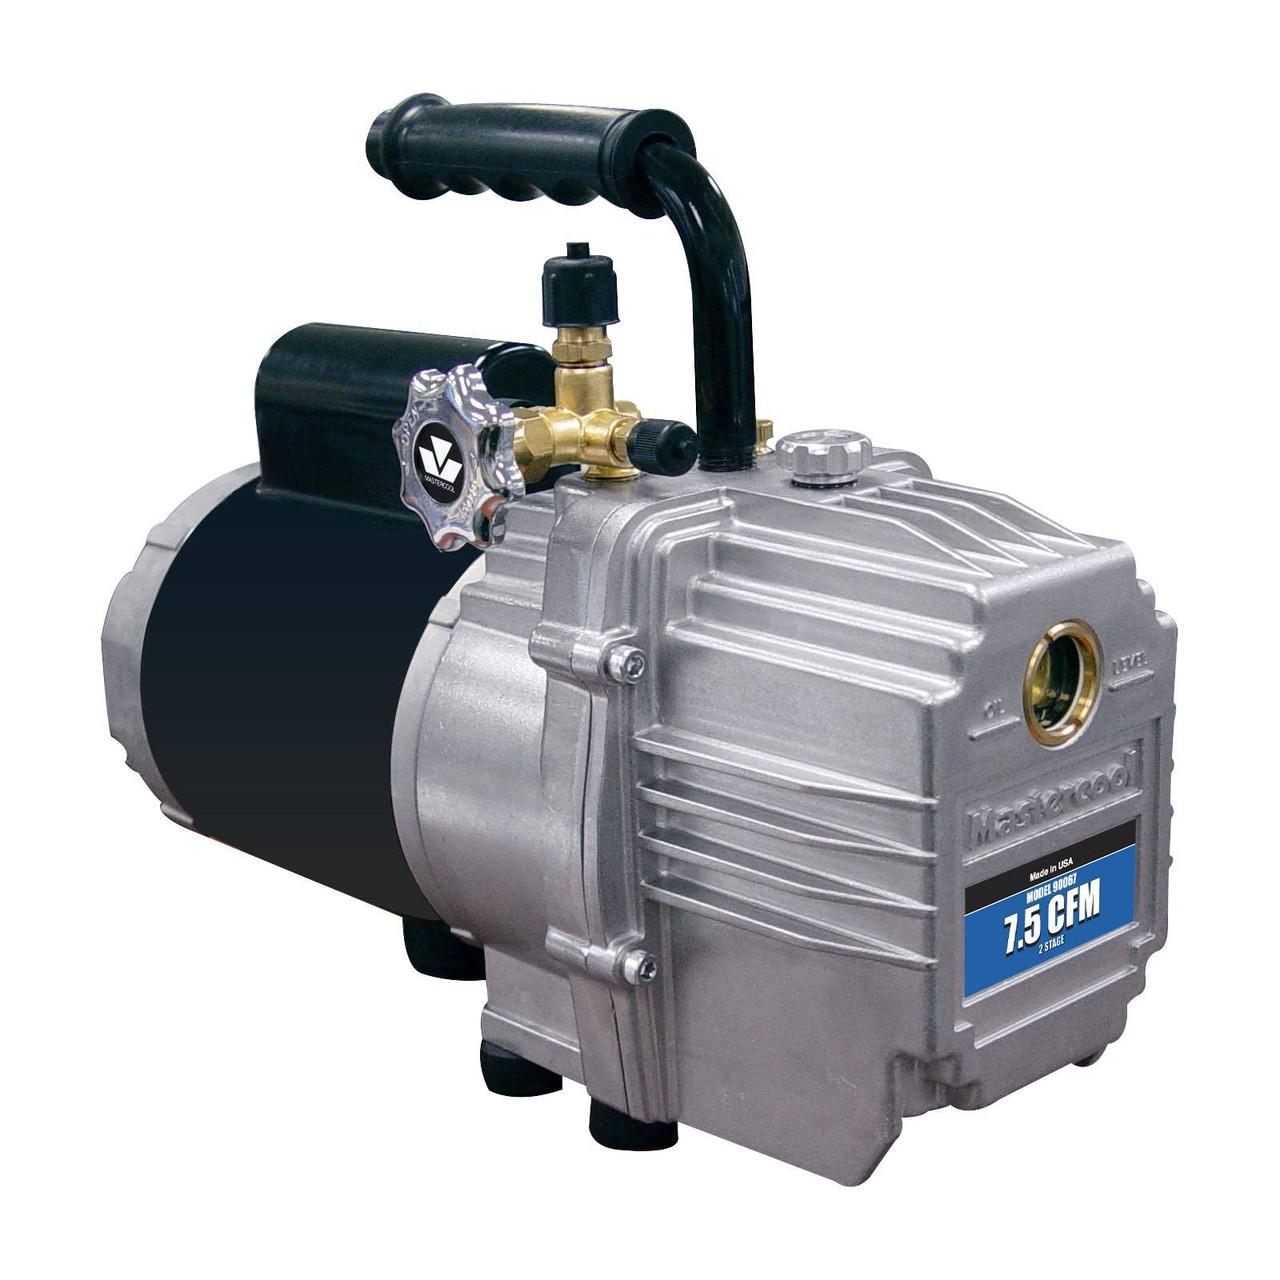 Mastercool - Vacuum Pump